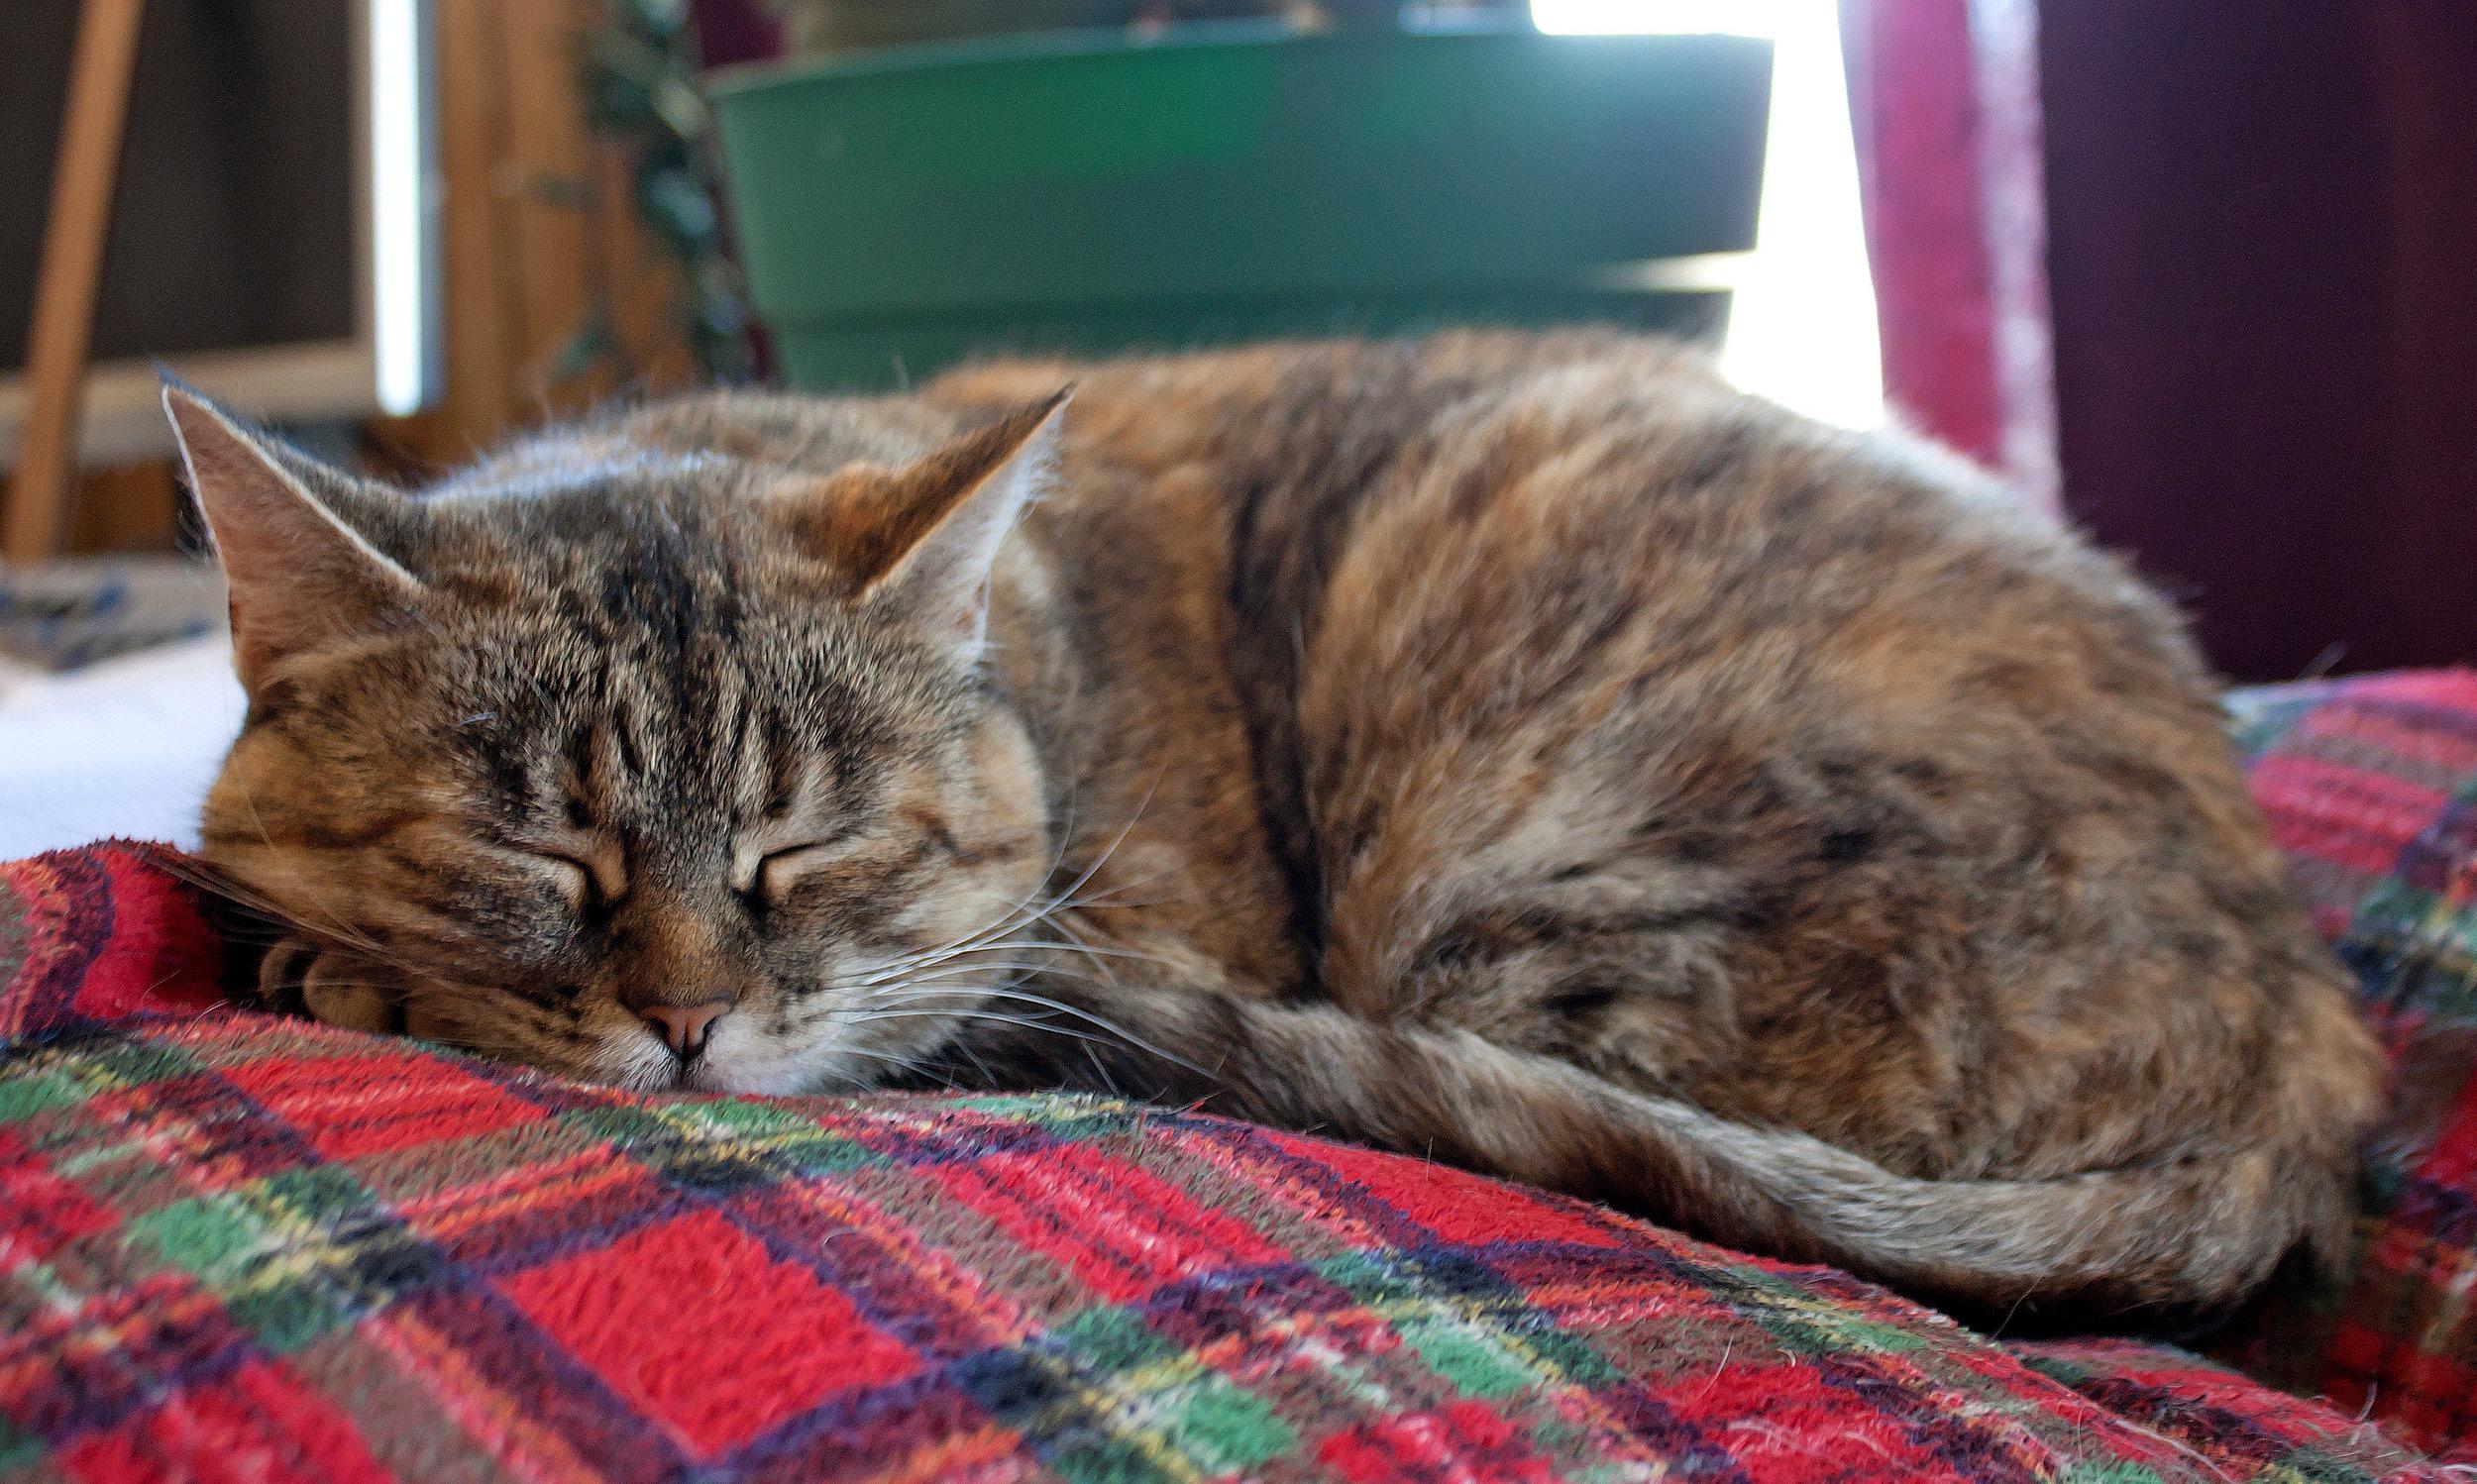 cat-sleeping-on-blanket_G1YFOIOd.jpg